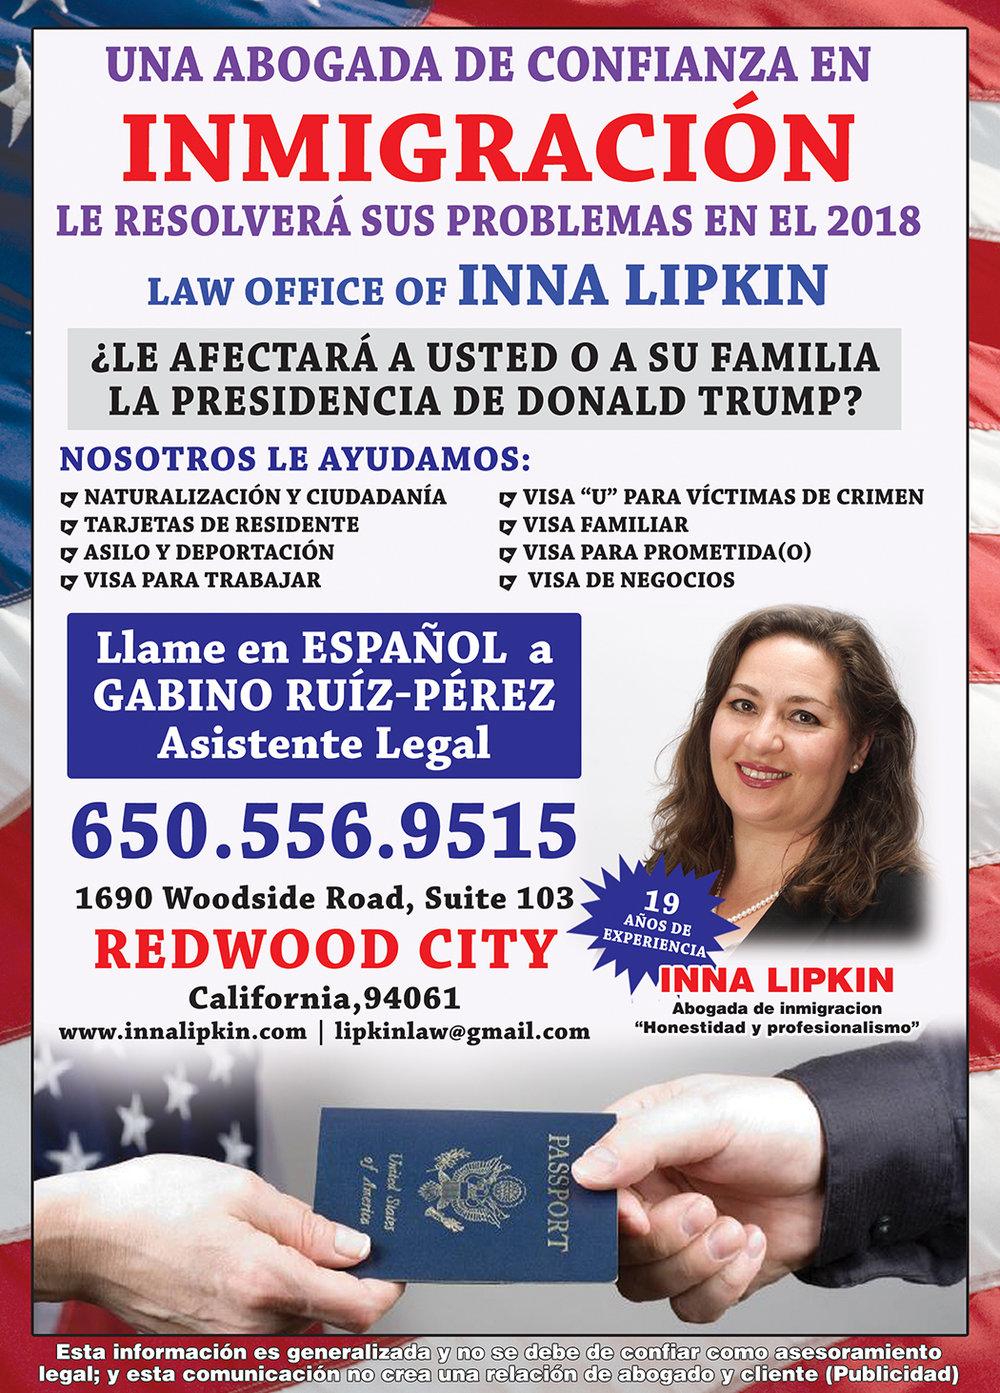 Inna Lipkin Law Office 1 pag DIC 2017.jpg